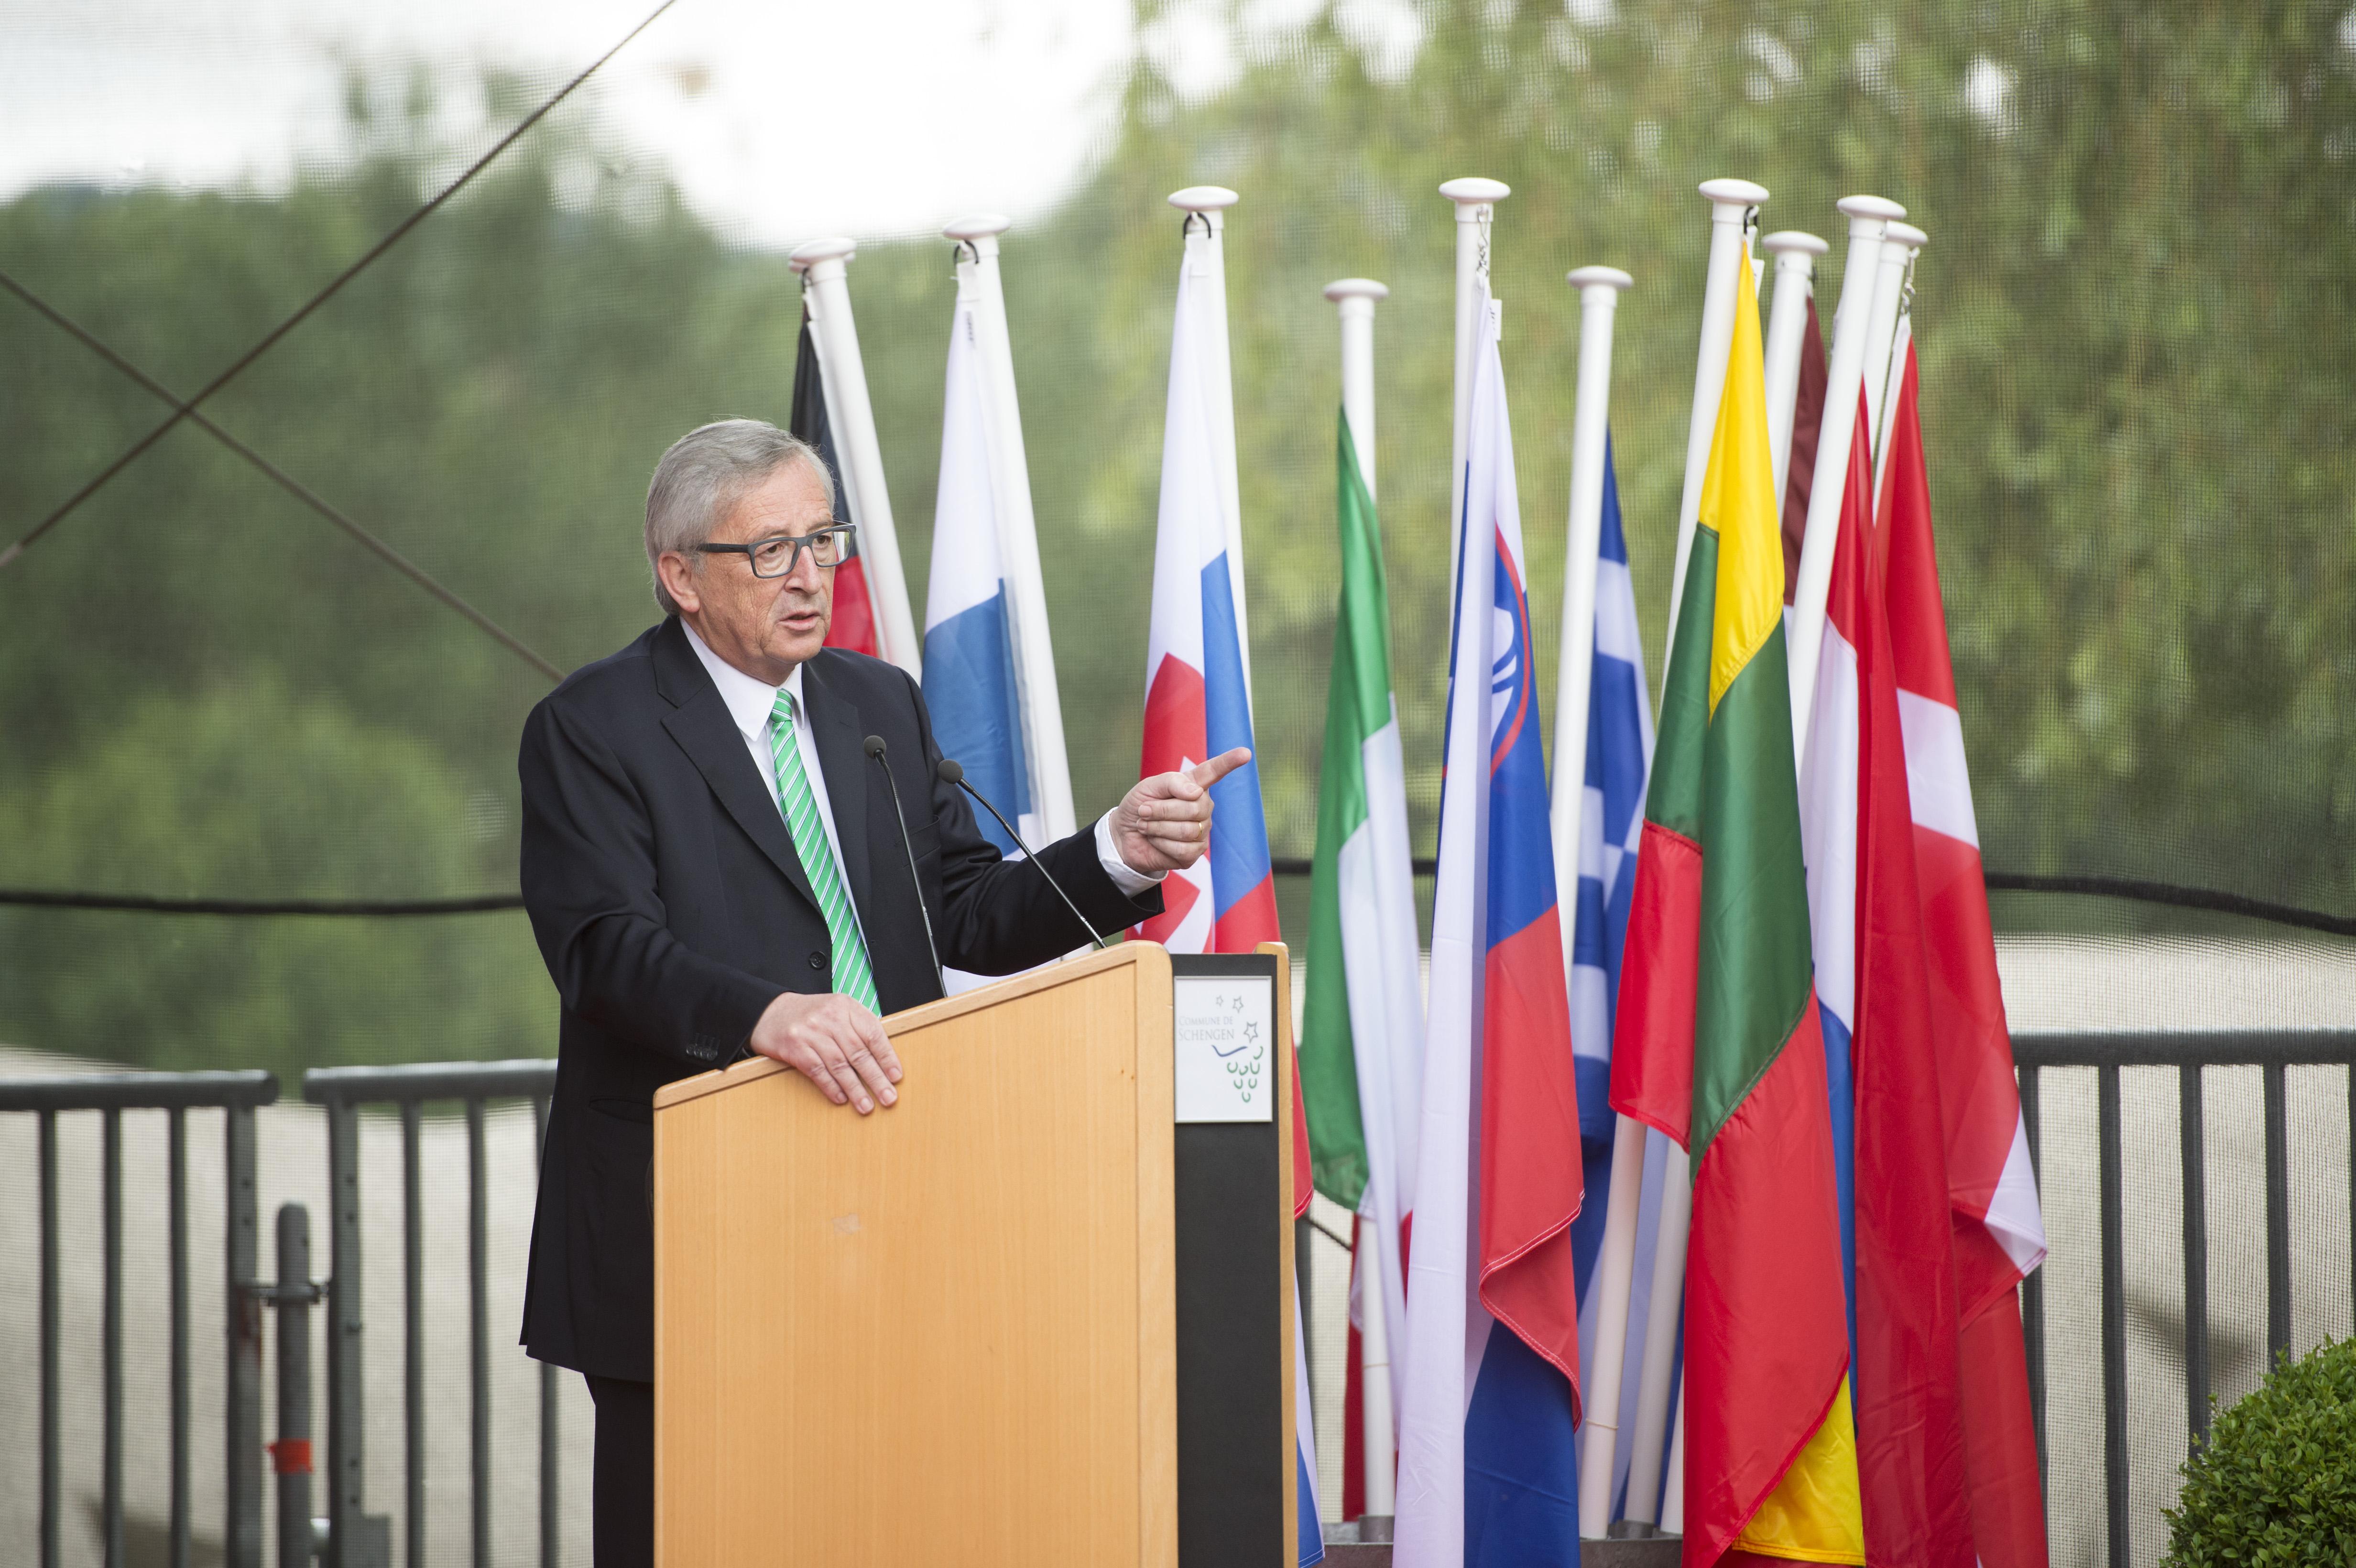 Juncker Marks 30th Anniversary Of Schengen Agreement Euractiv